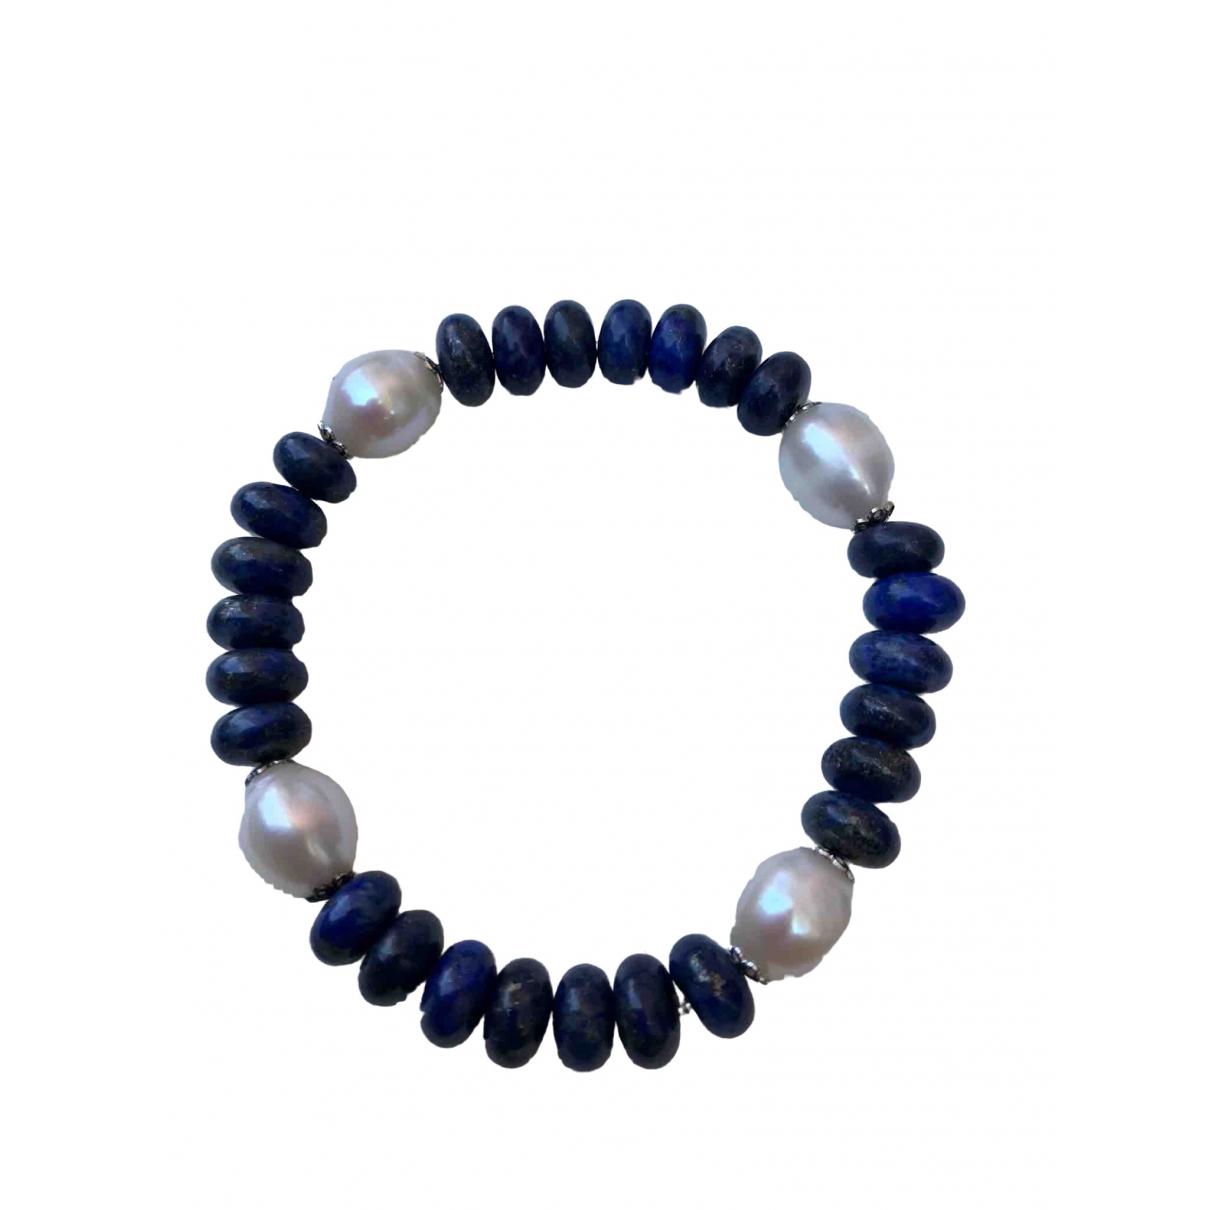 Pulsera Lapis lazuli de Perlas Non Signe / Unsigned